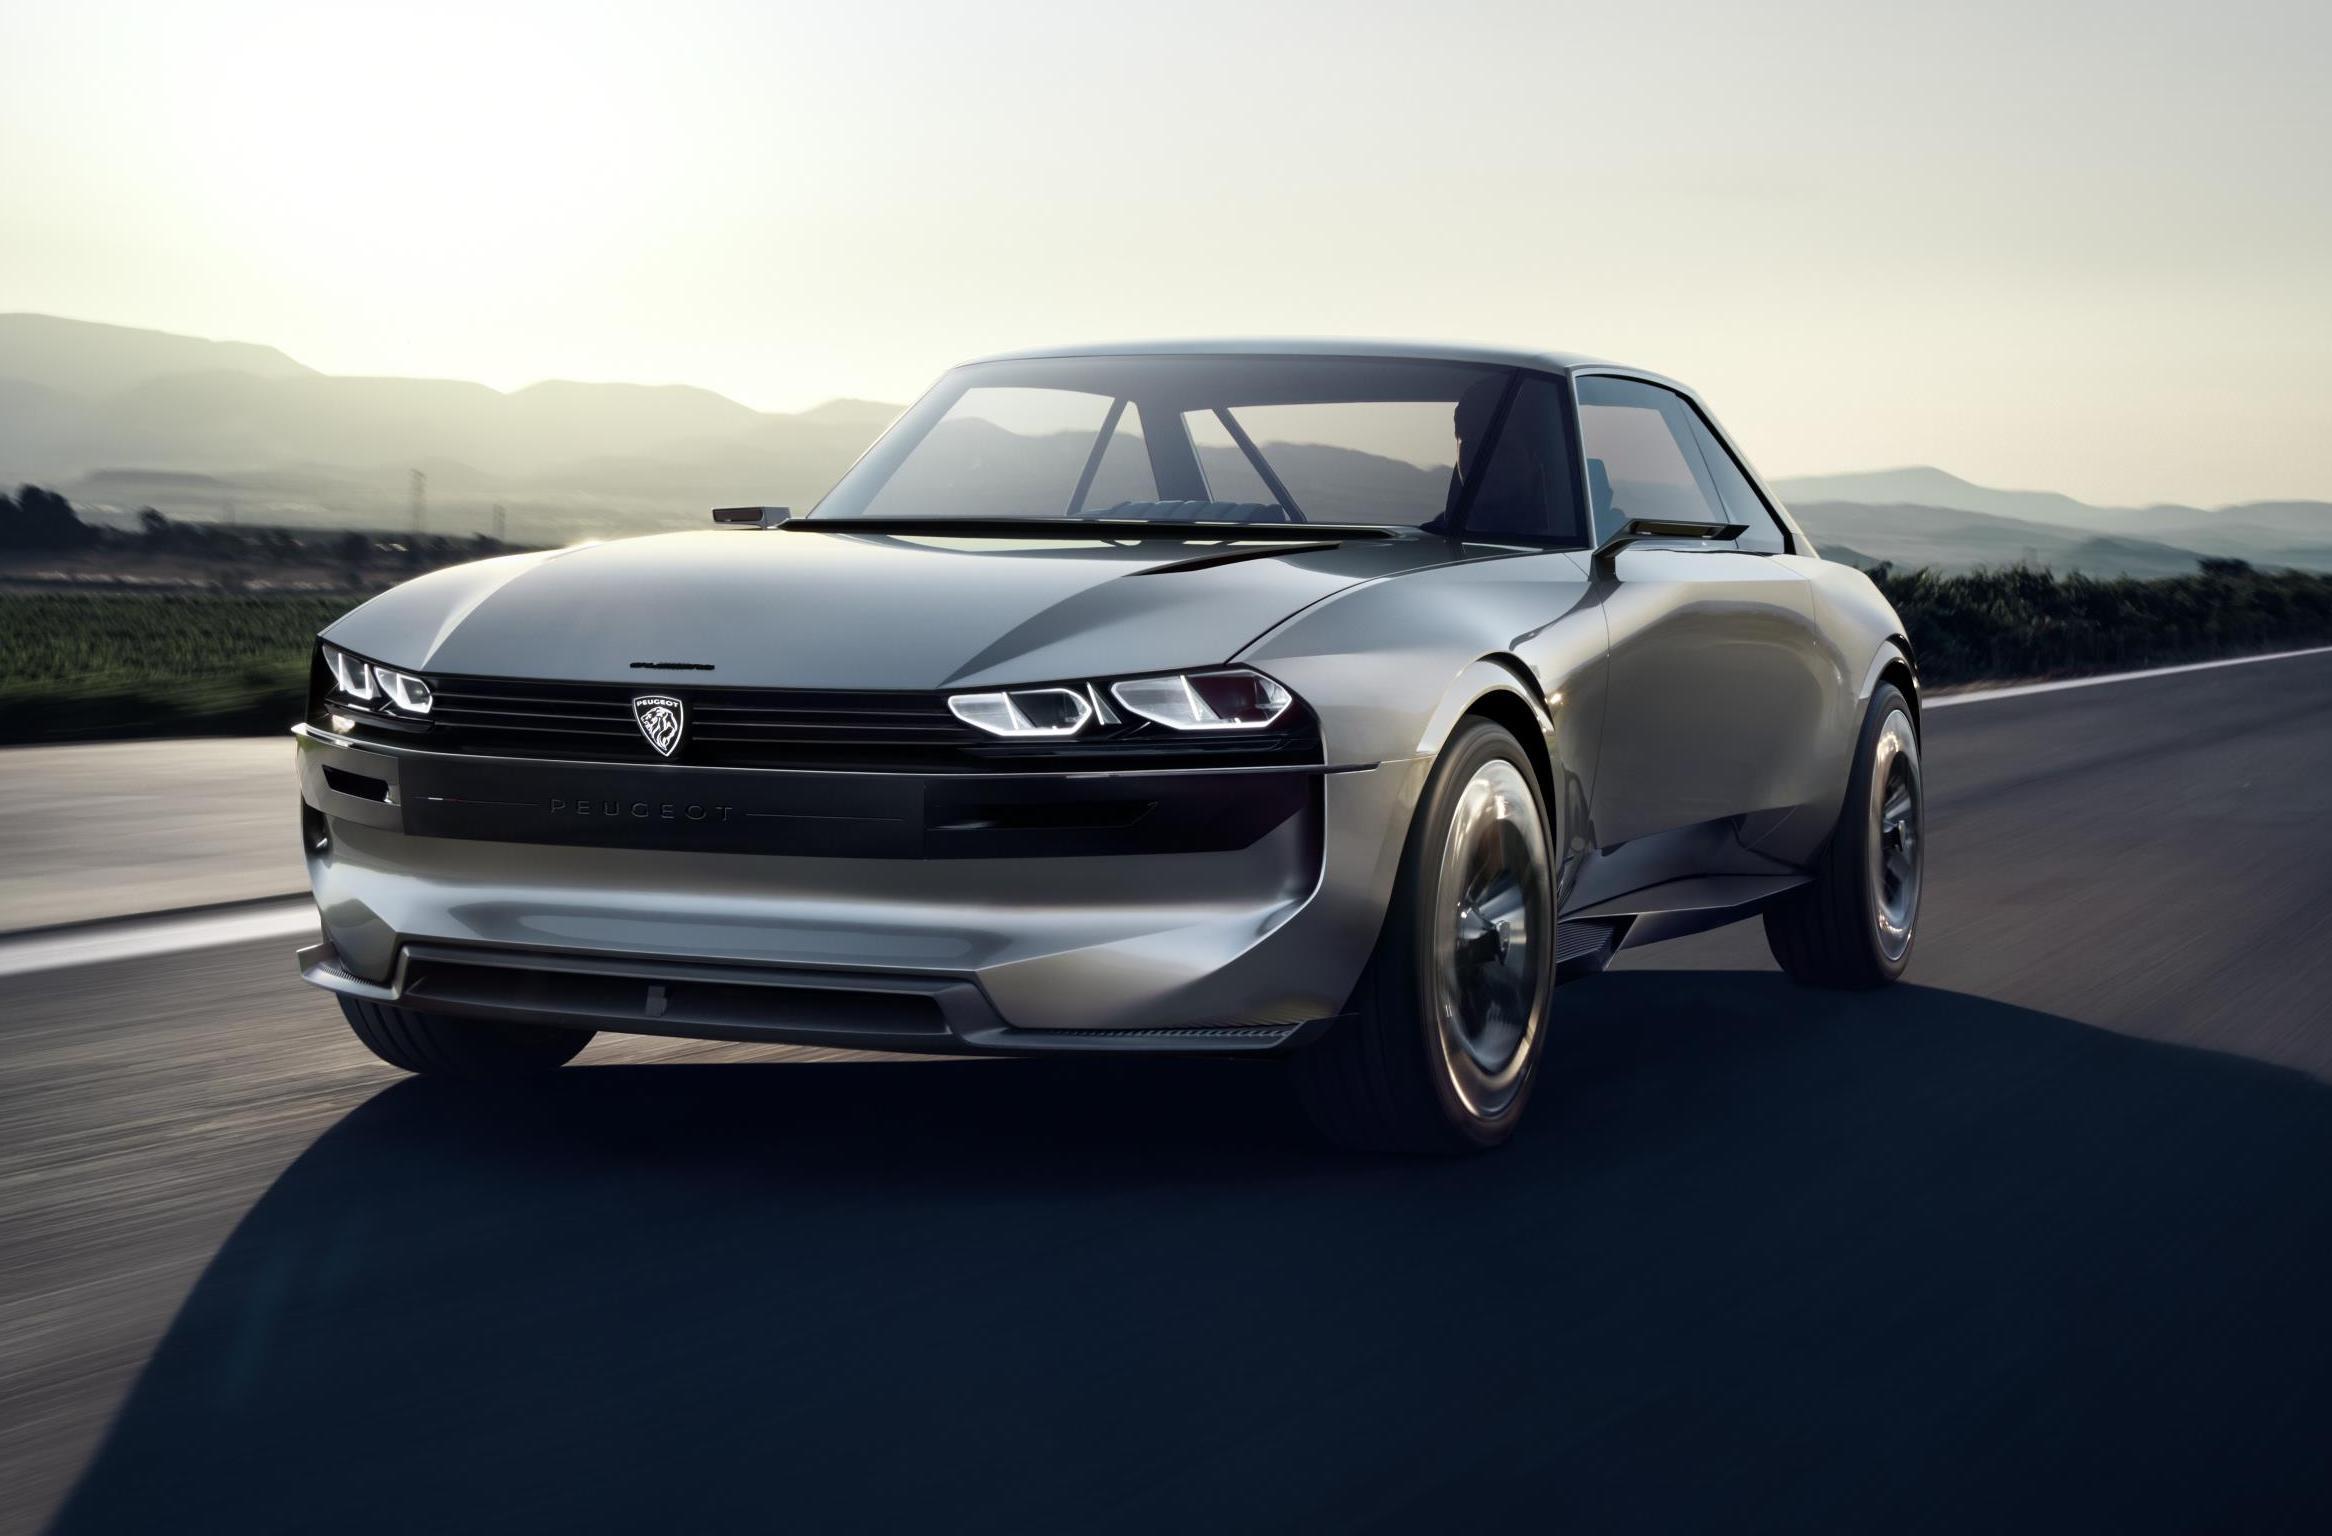 Heritage Volkswagen Subaru >> Peugeot e-LEGEND concept revealed, looks cool ...